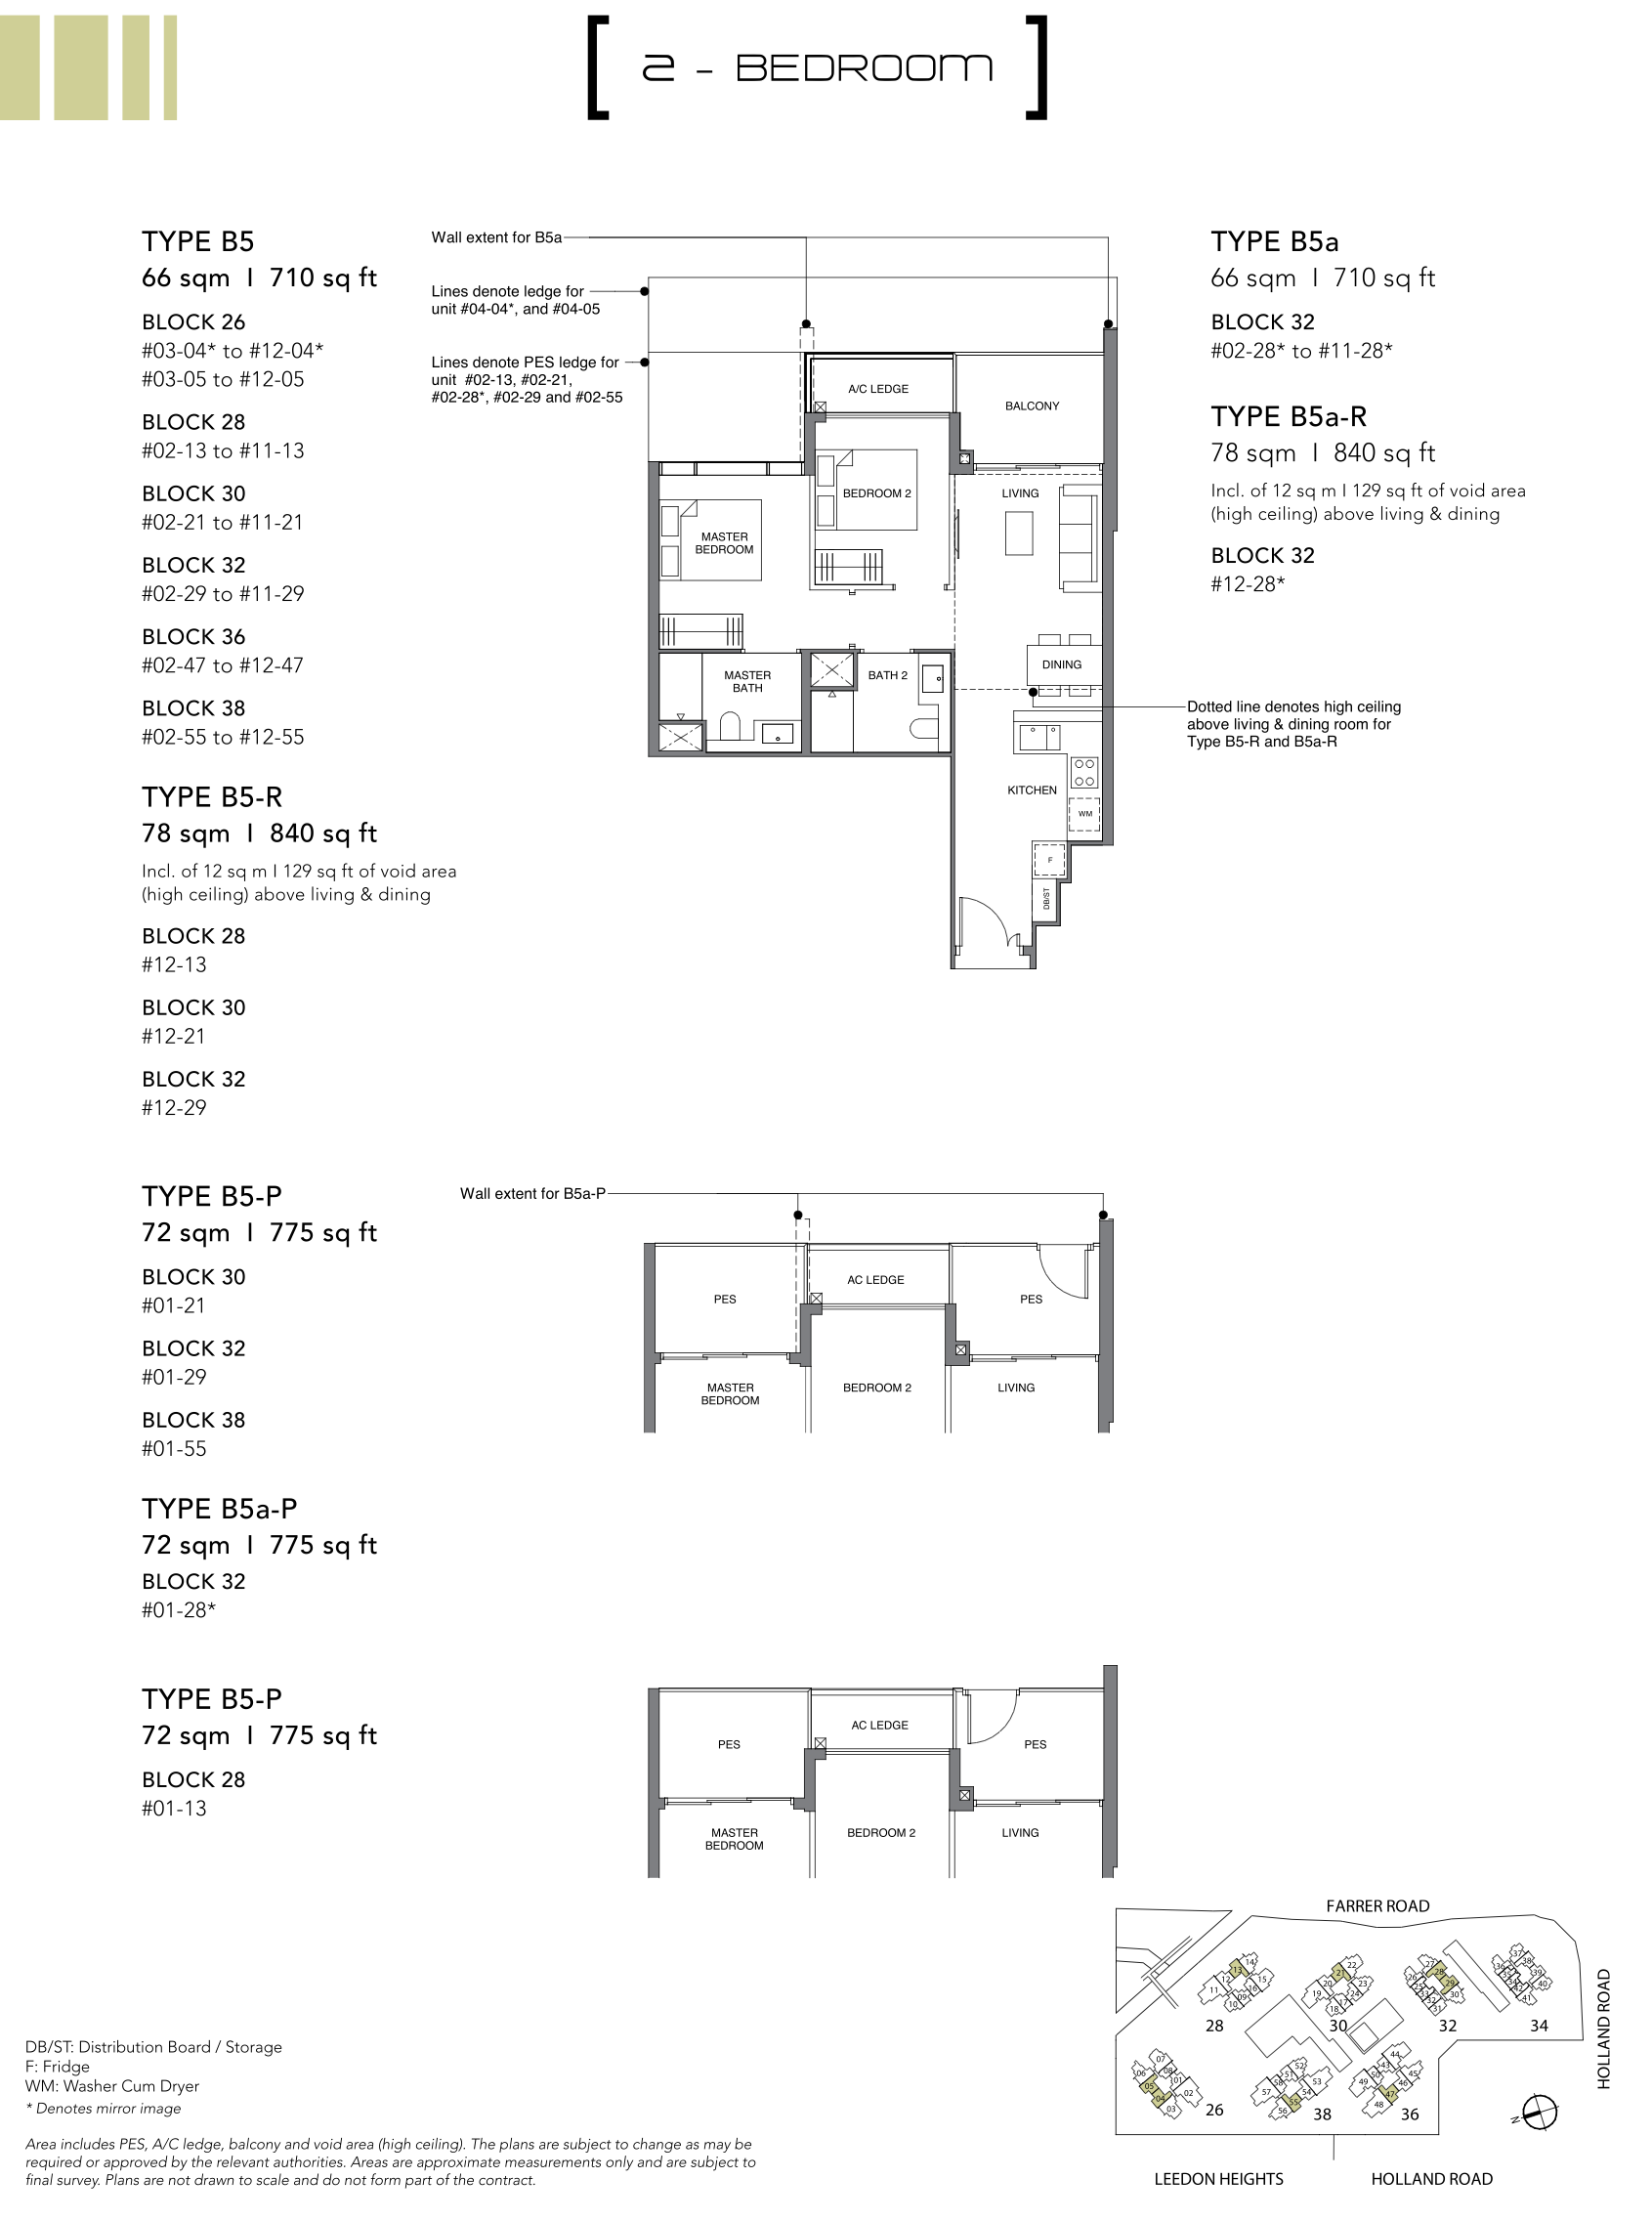 绿墩雅苑公寓户型图 Leedon Green floor plan 2 bedroom b5-b4a